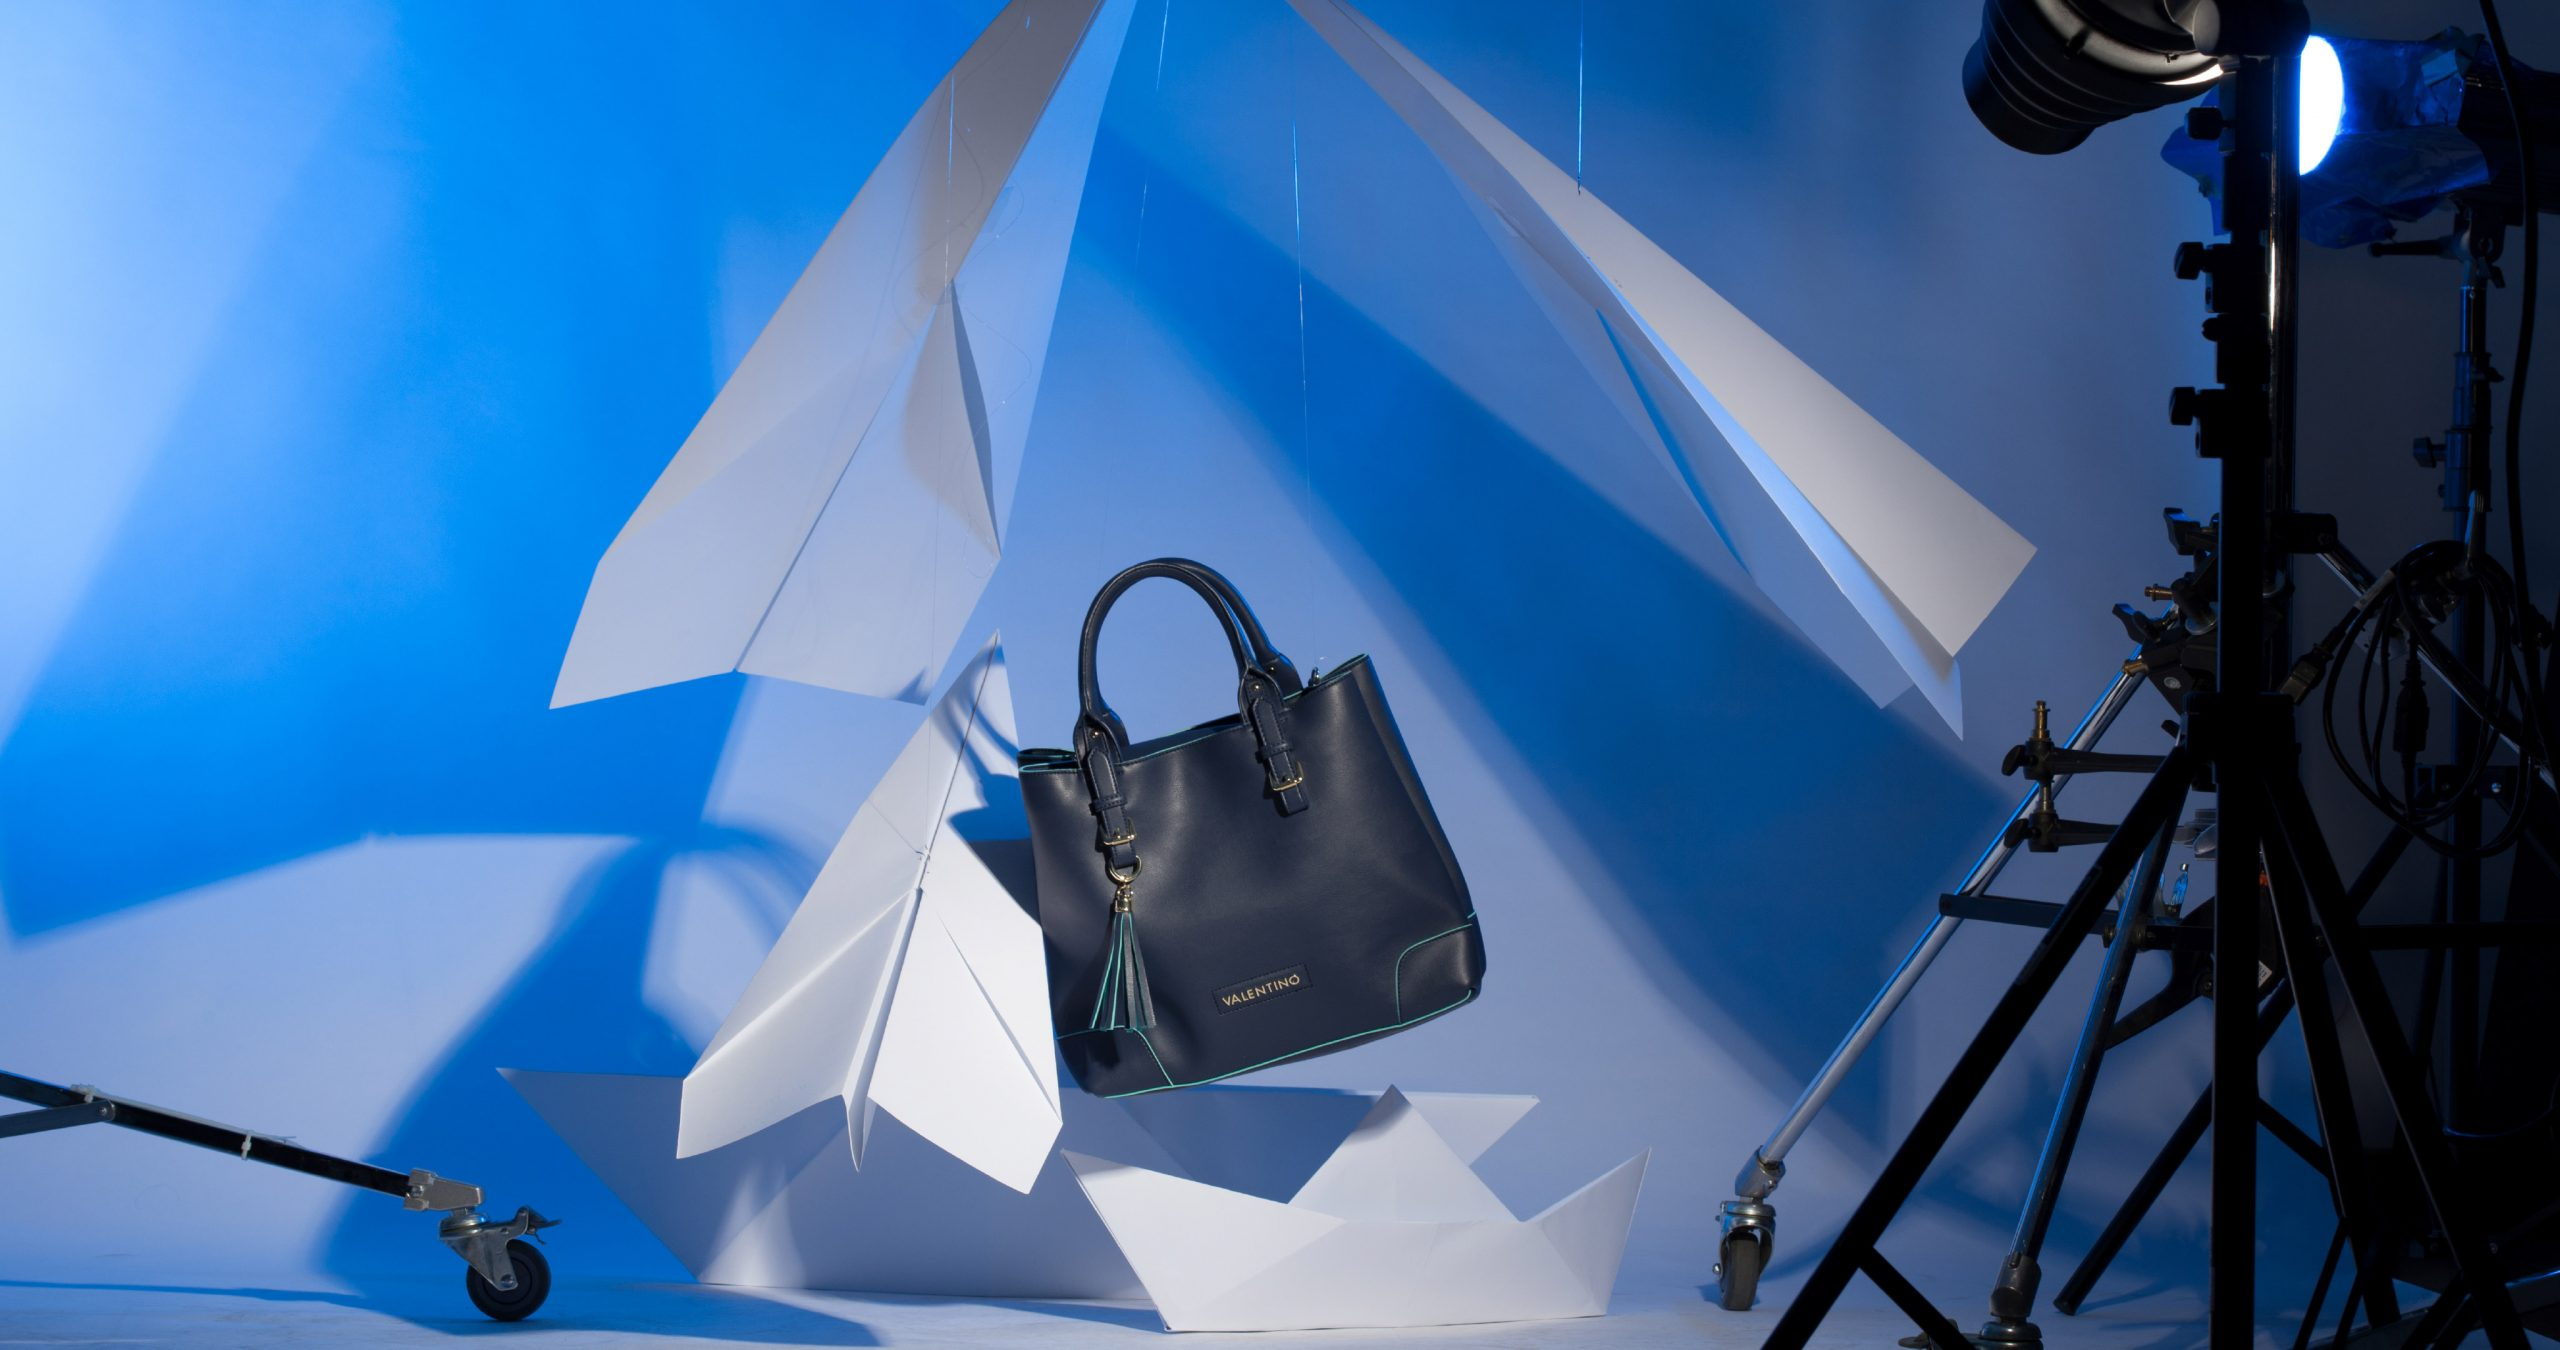 slider-fashion-behind-the-shoot-handbag-product-concept-advertising-photography